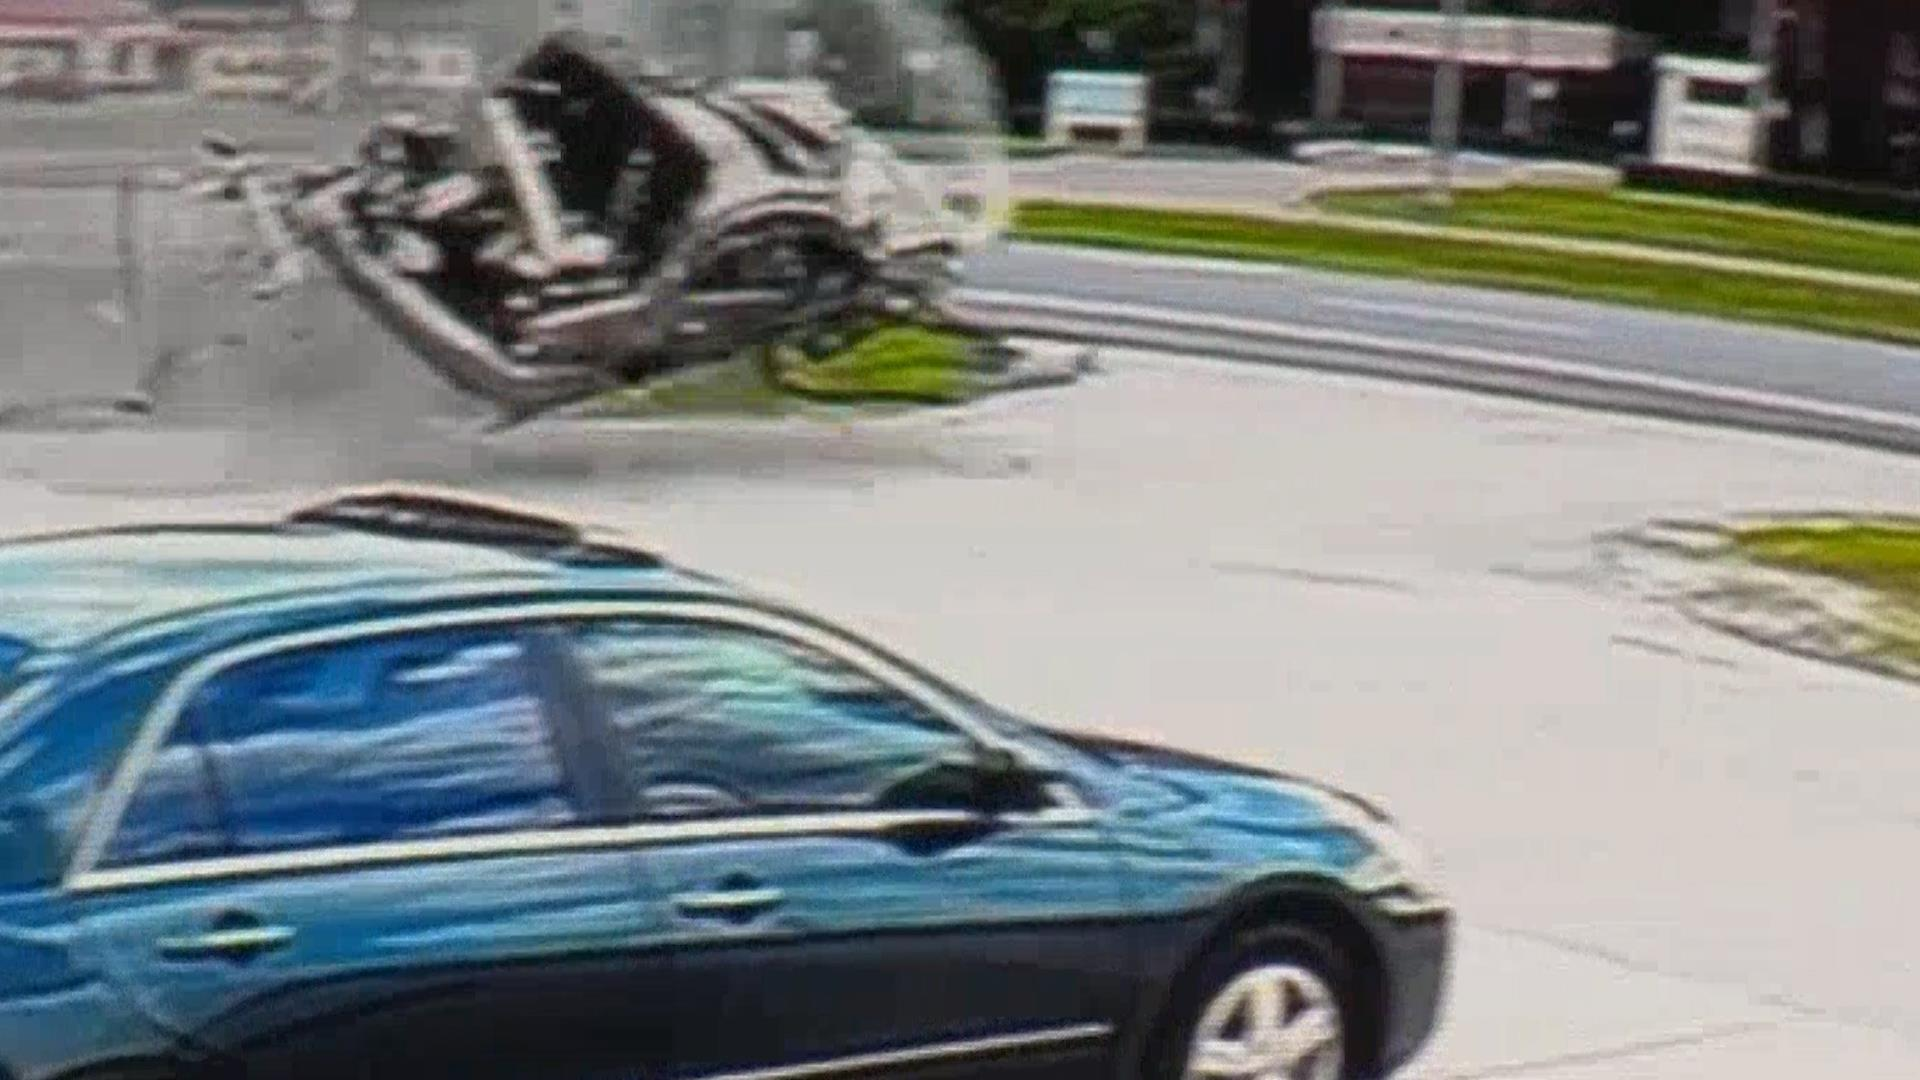 Shocking Car Crash Caught on Surveillance Camera